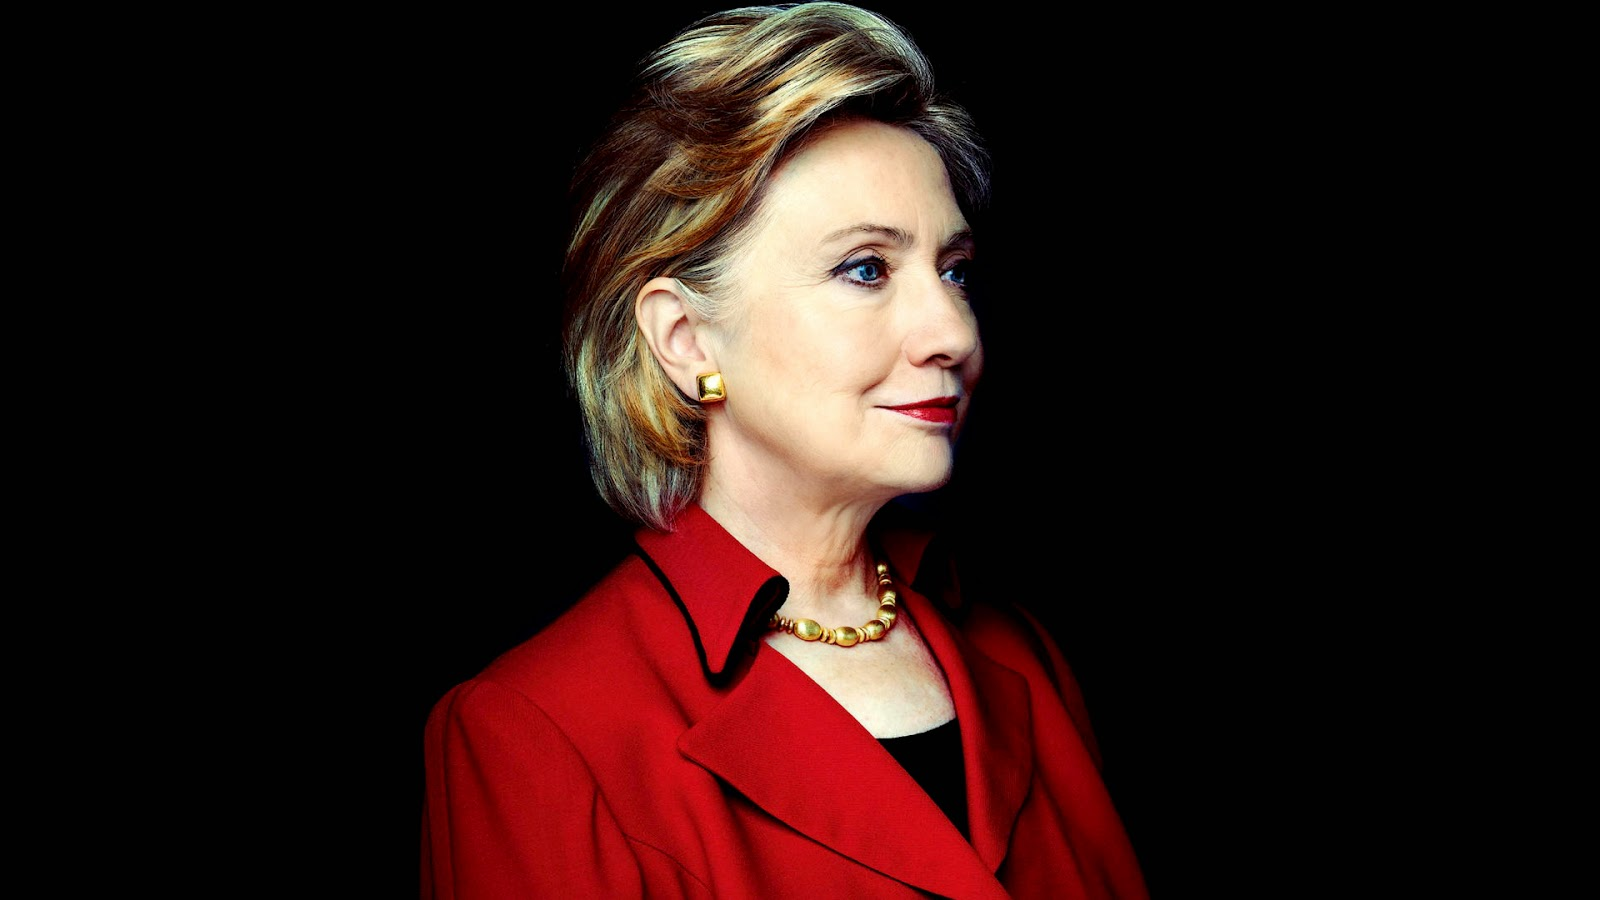 Hillary Clinton Wallpaper - WallpaperSafari